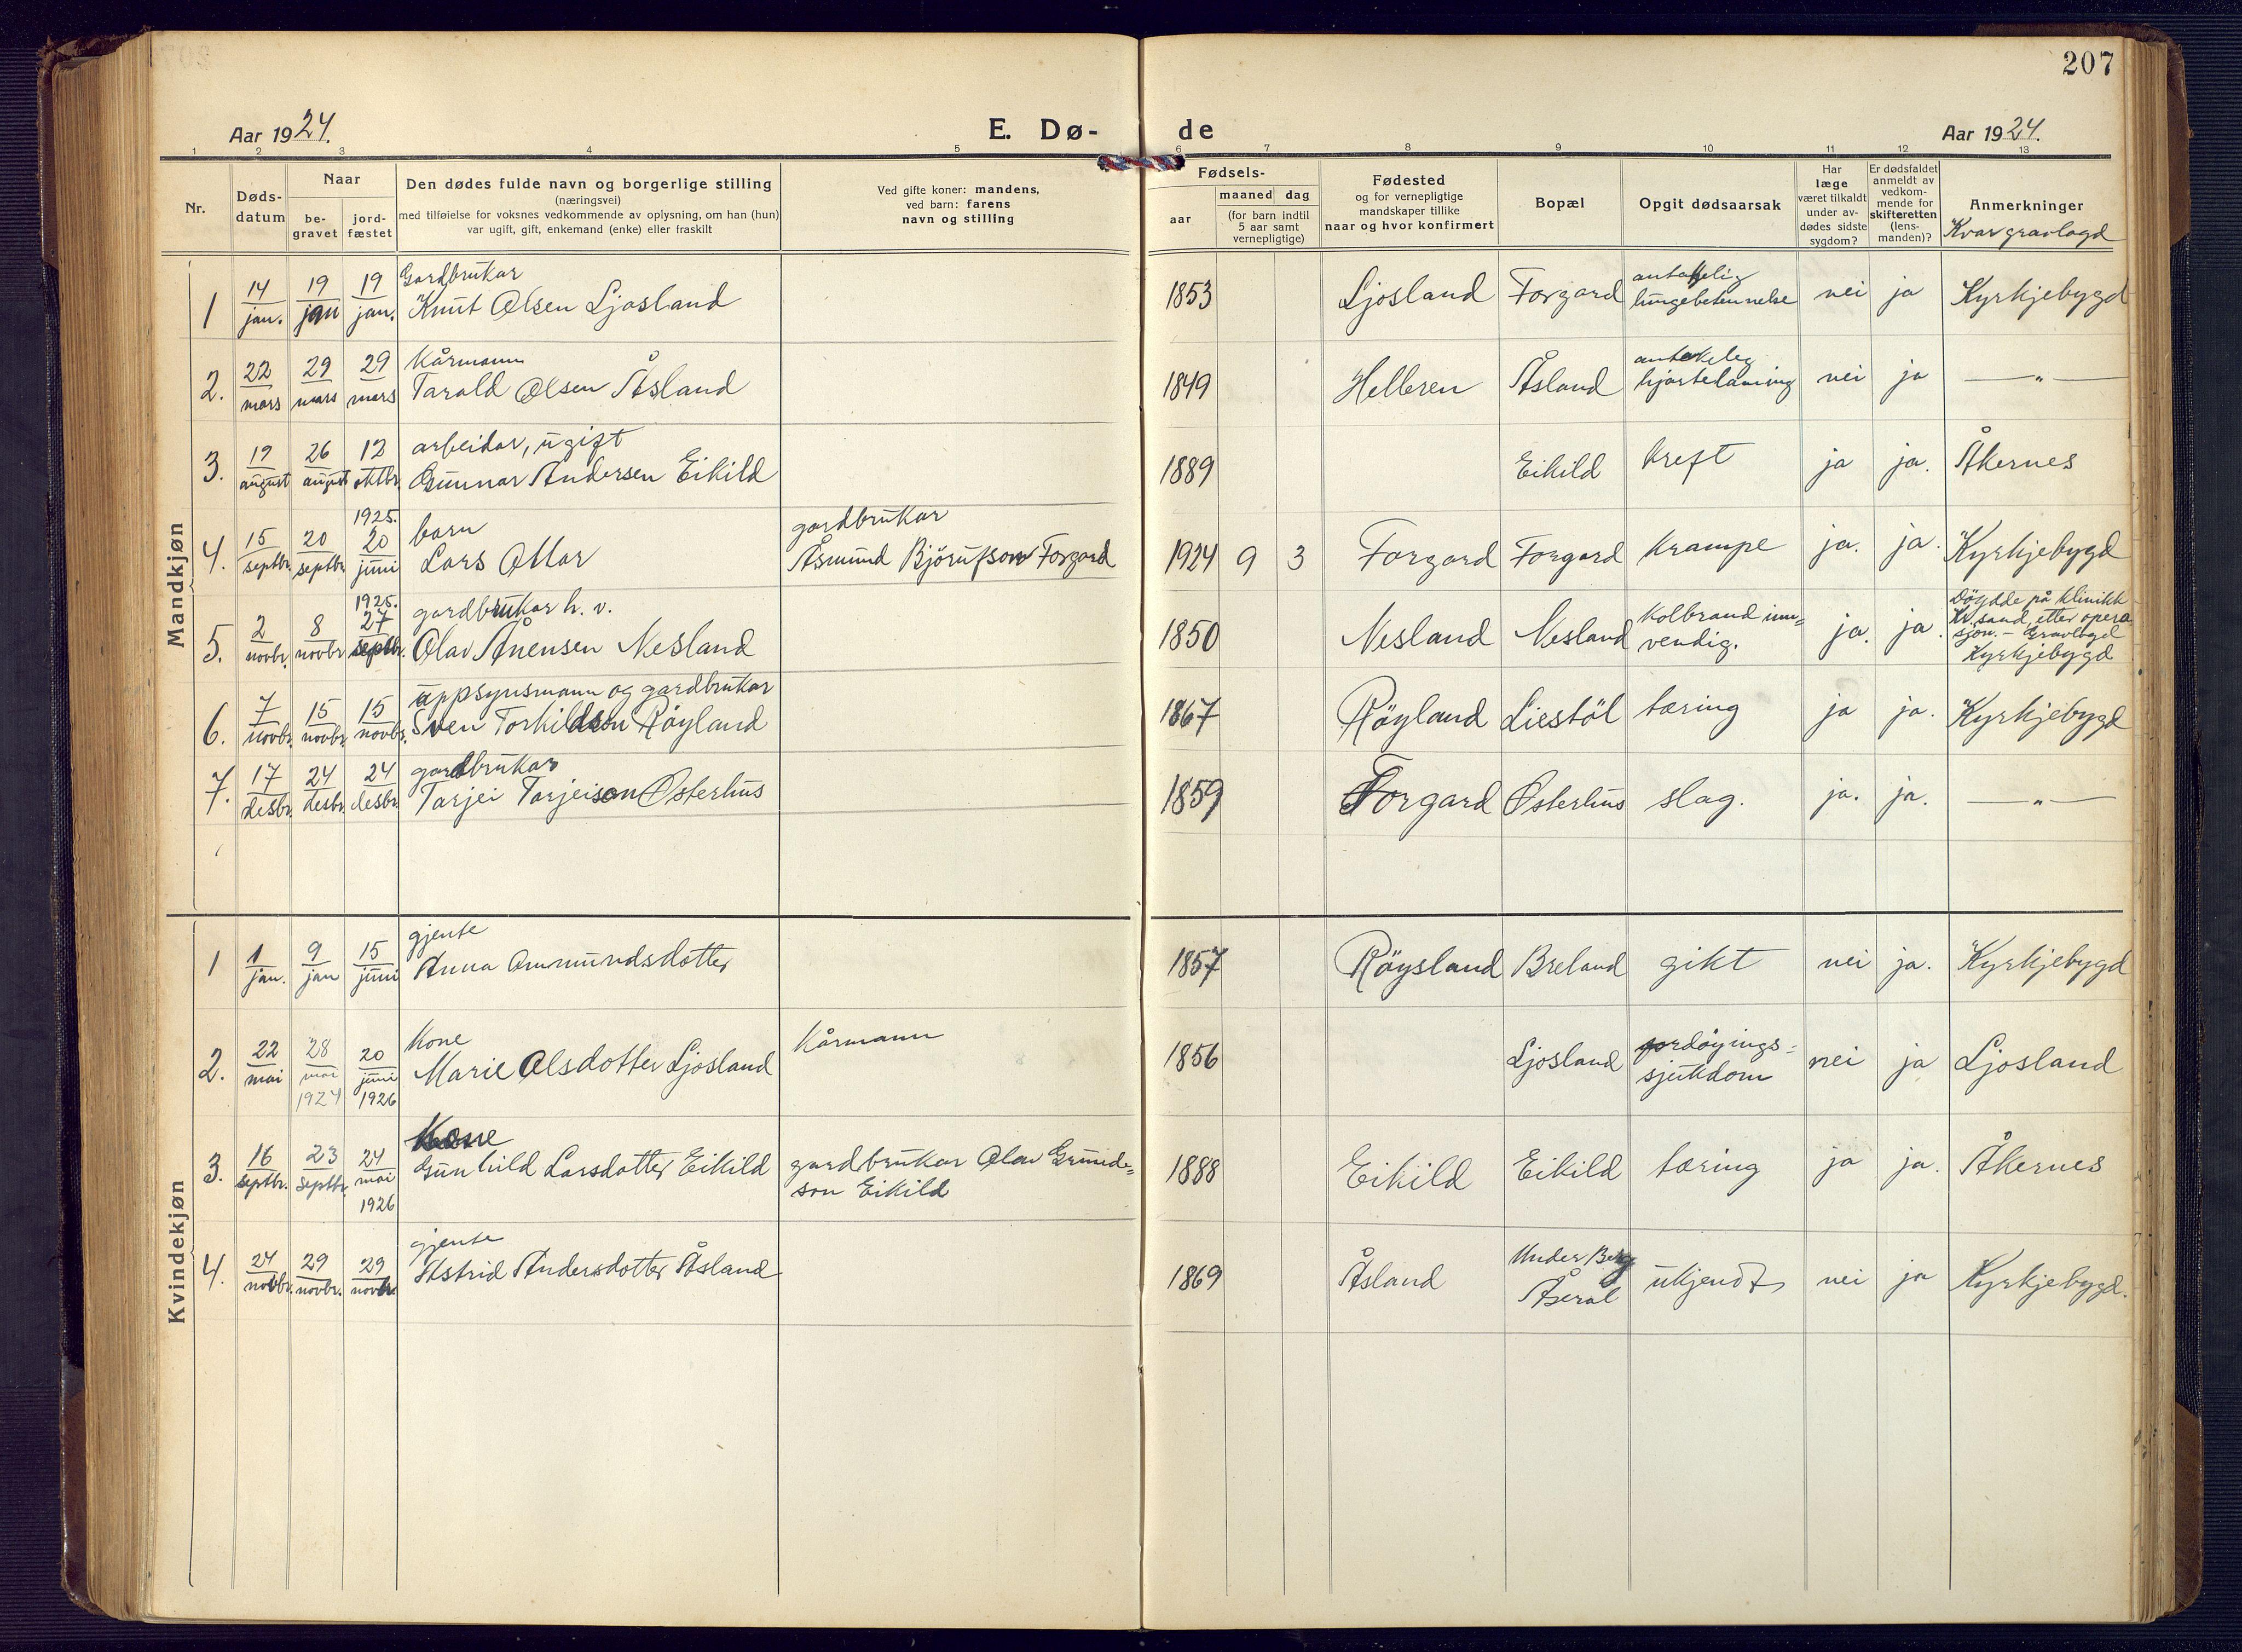 SAK, Åseral sokneprestkontor, F/Fb/L0004: Klokkerbok nr. B 4, 1920-1946, s. 207